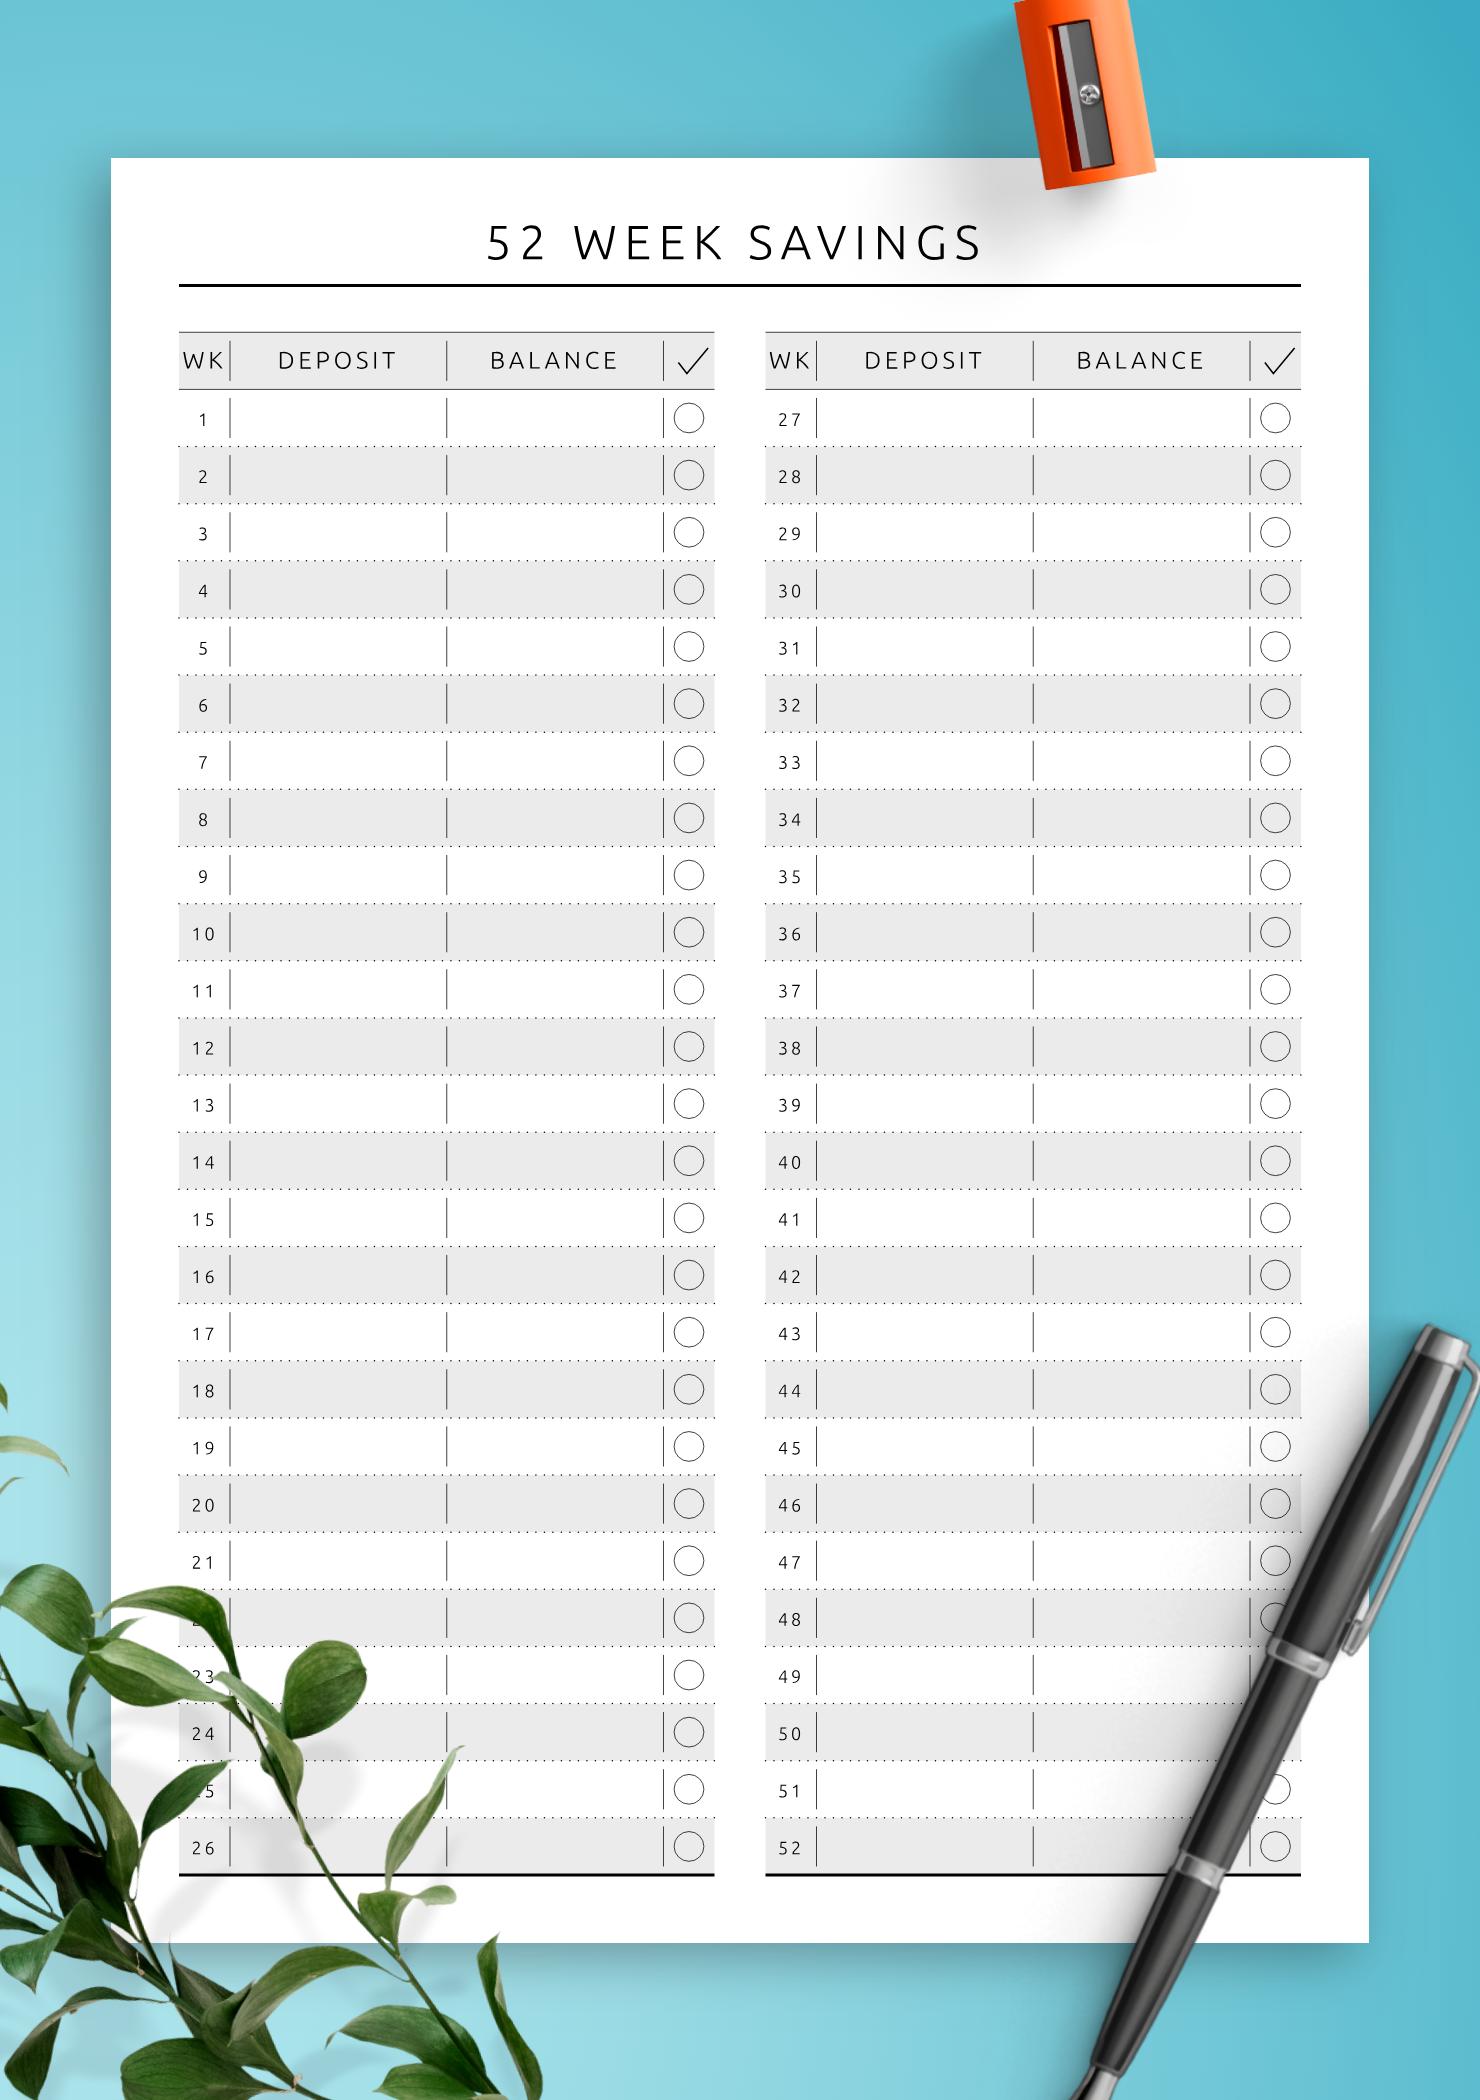 photo relating to Savings Printable identify Cost-free Printable 52 7 days Price savings - Authentic Design PDF Obtain